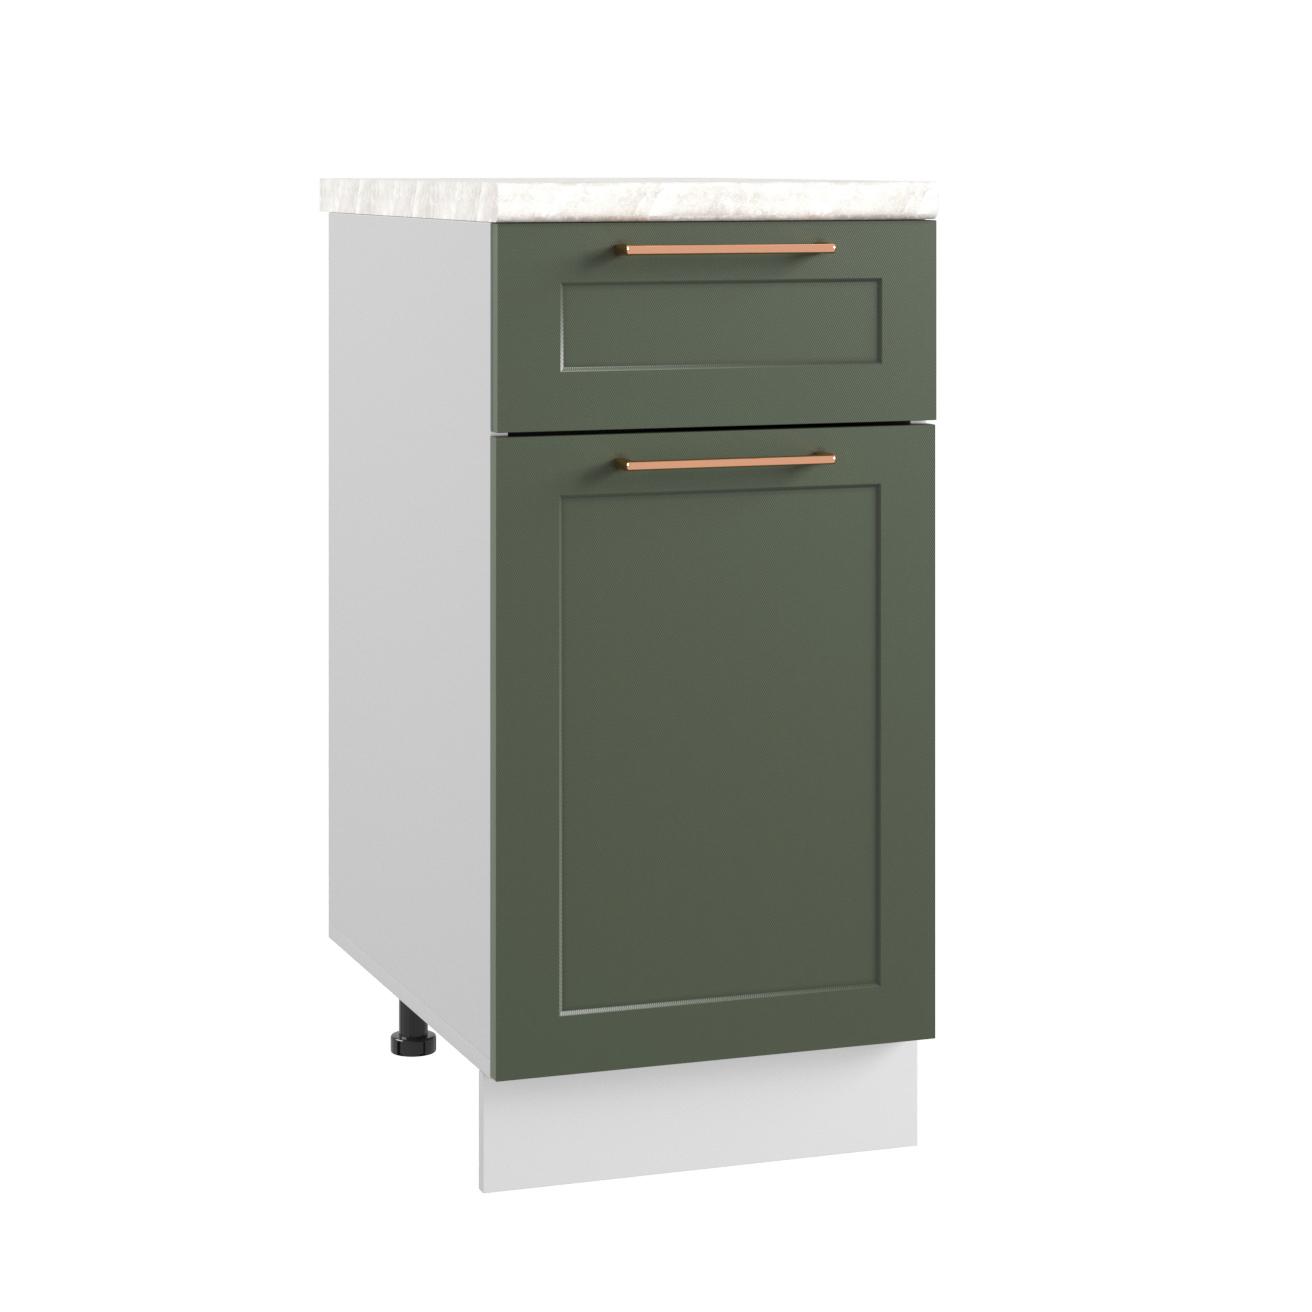 Кухня Квадро С1Я 400 Шкаф нижний с ящиком